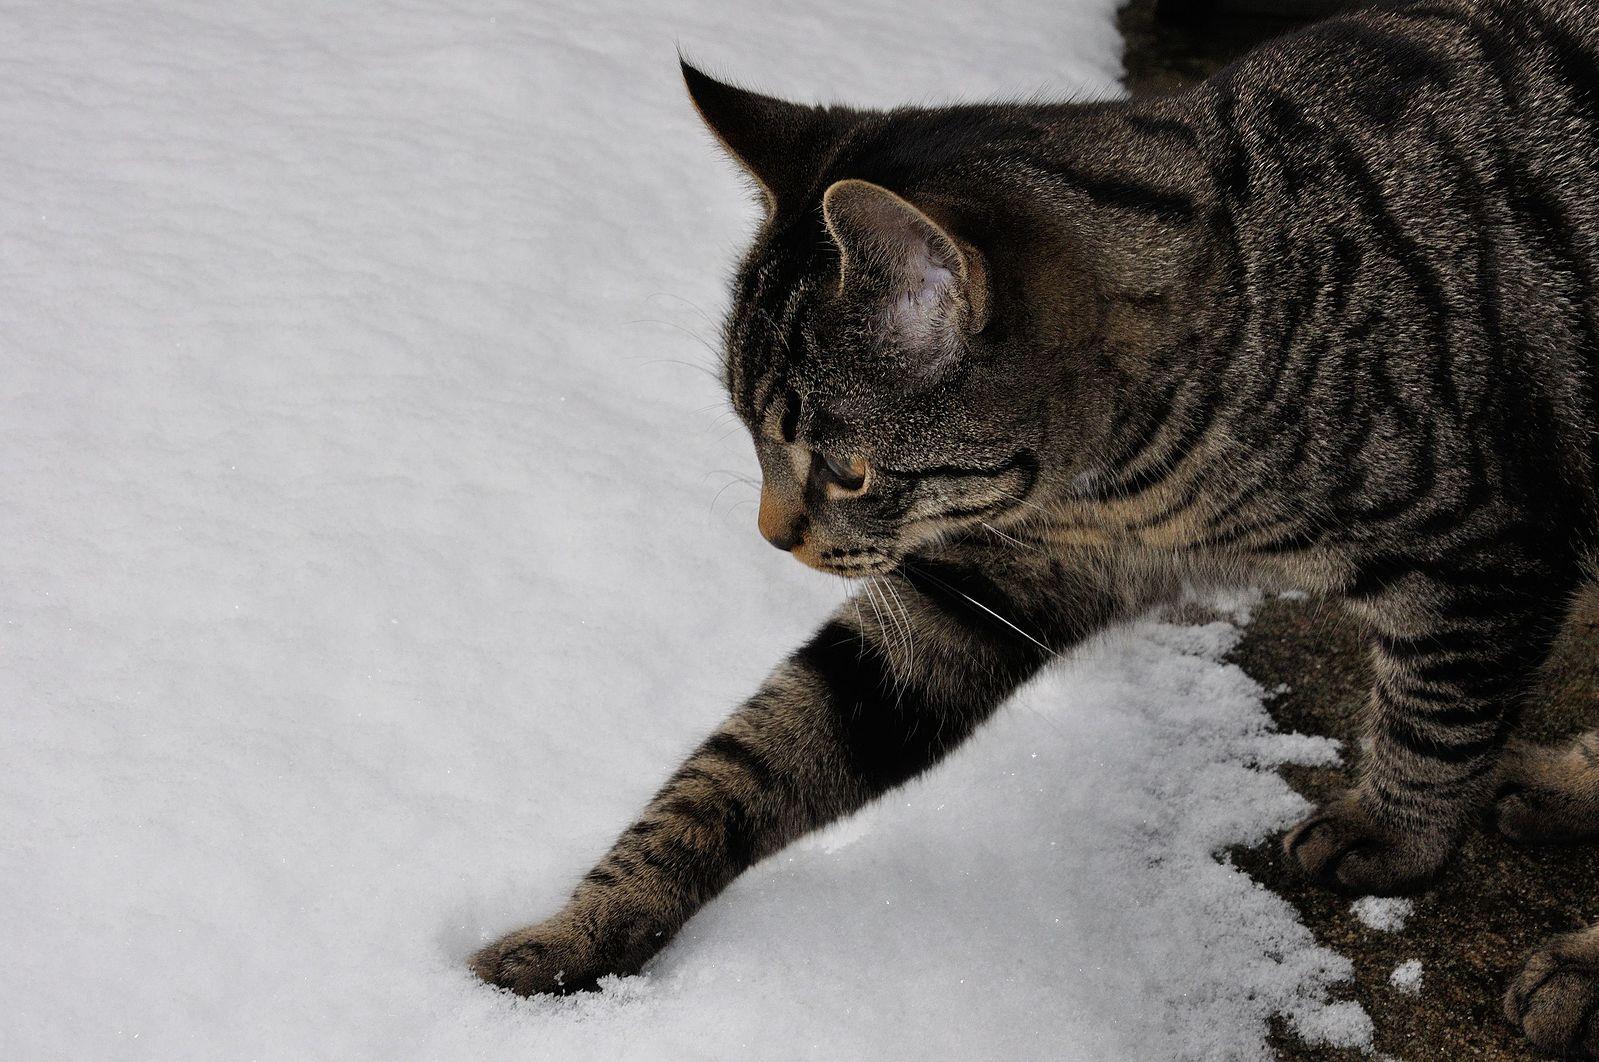 The_first_snow_8237187411.jpg